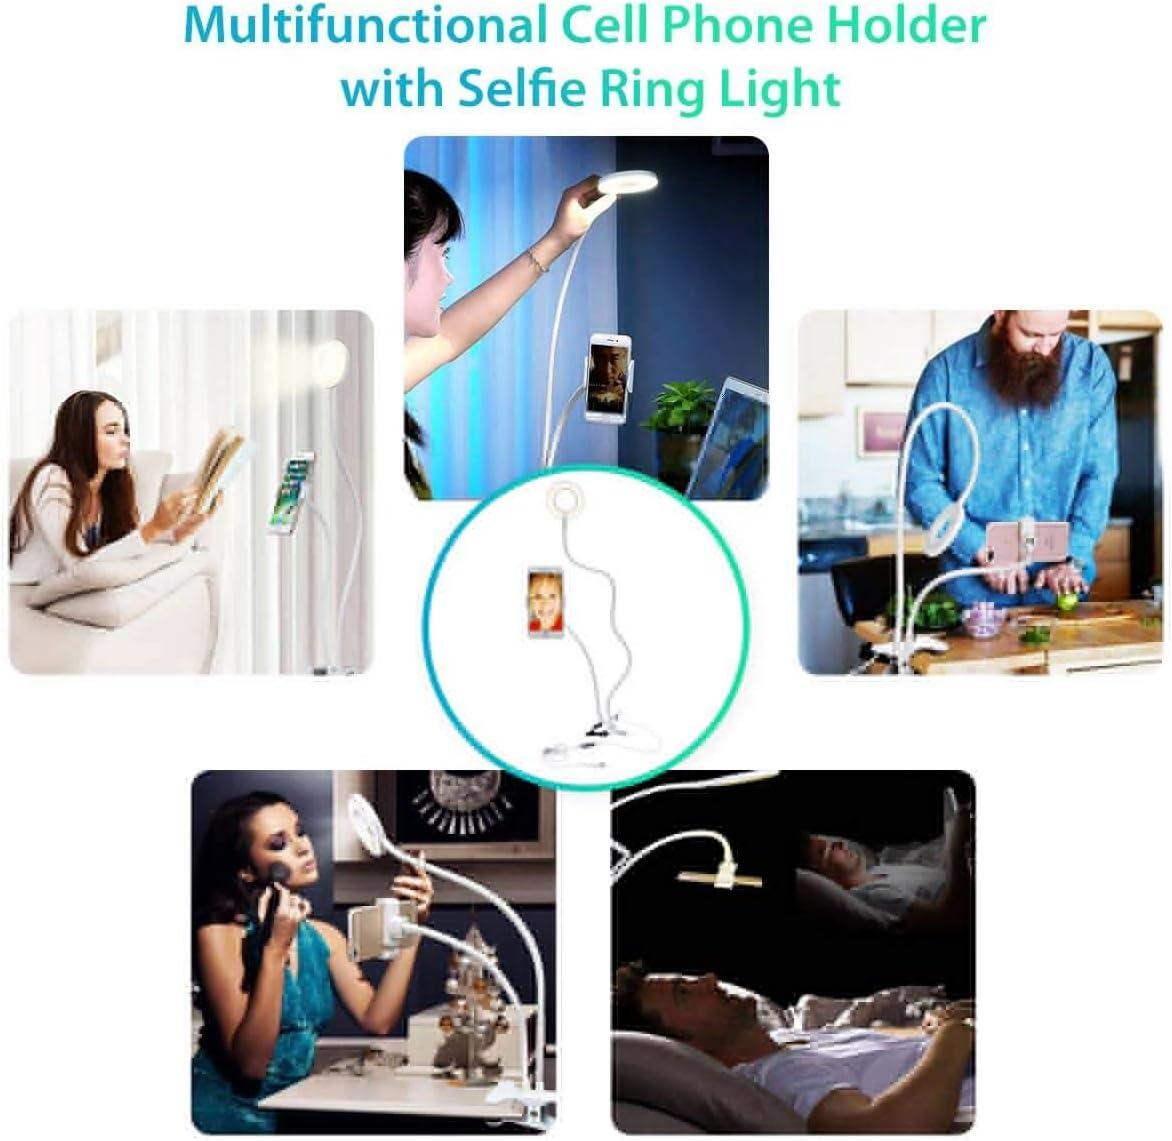 YAYONG LED Lighting USB Cell Phone Ring Light Selfie 3 Colors Adjustable Live Stream Makeup Camera Enhancing Fill Light